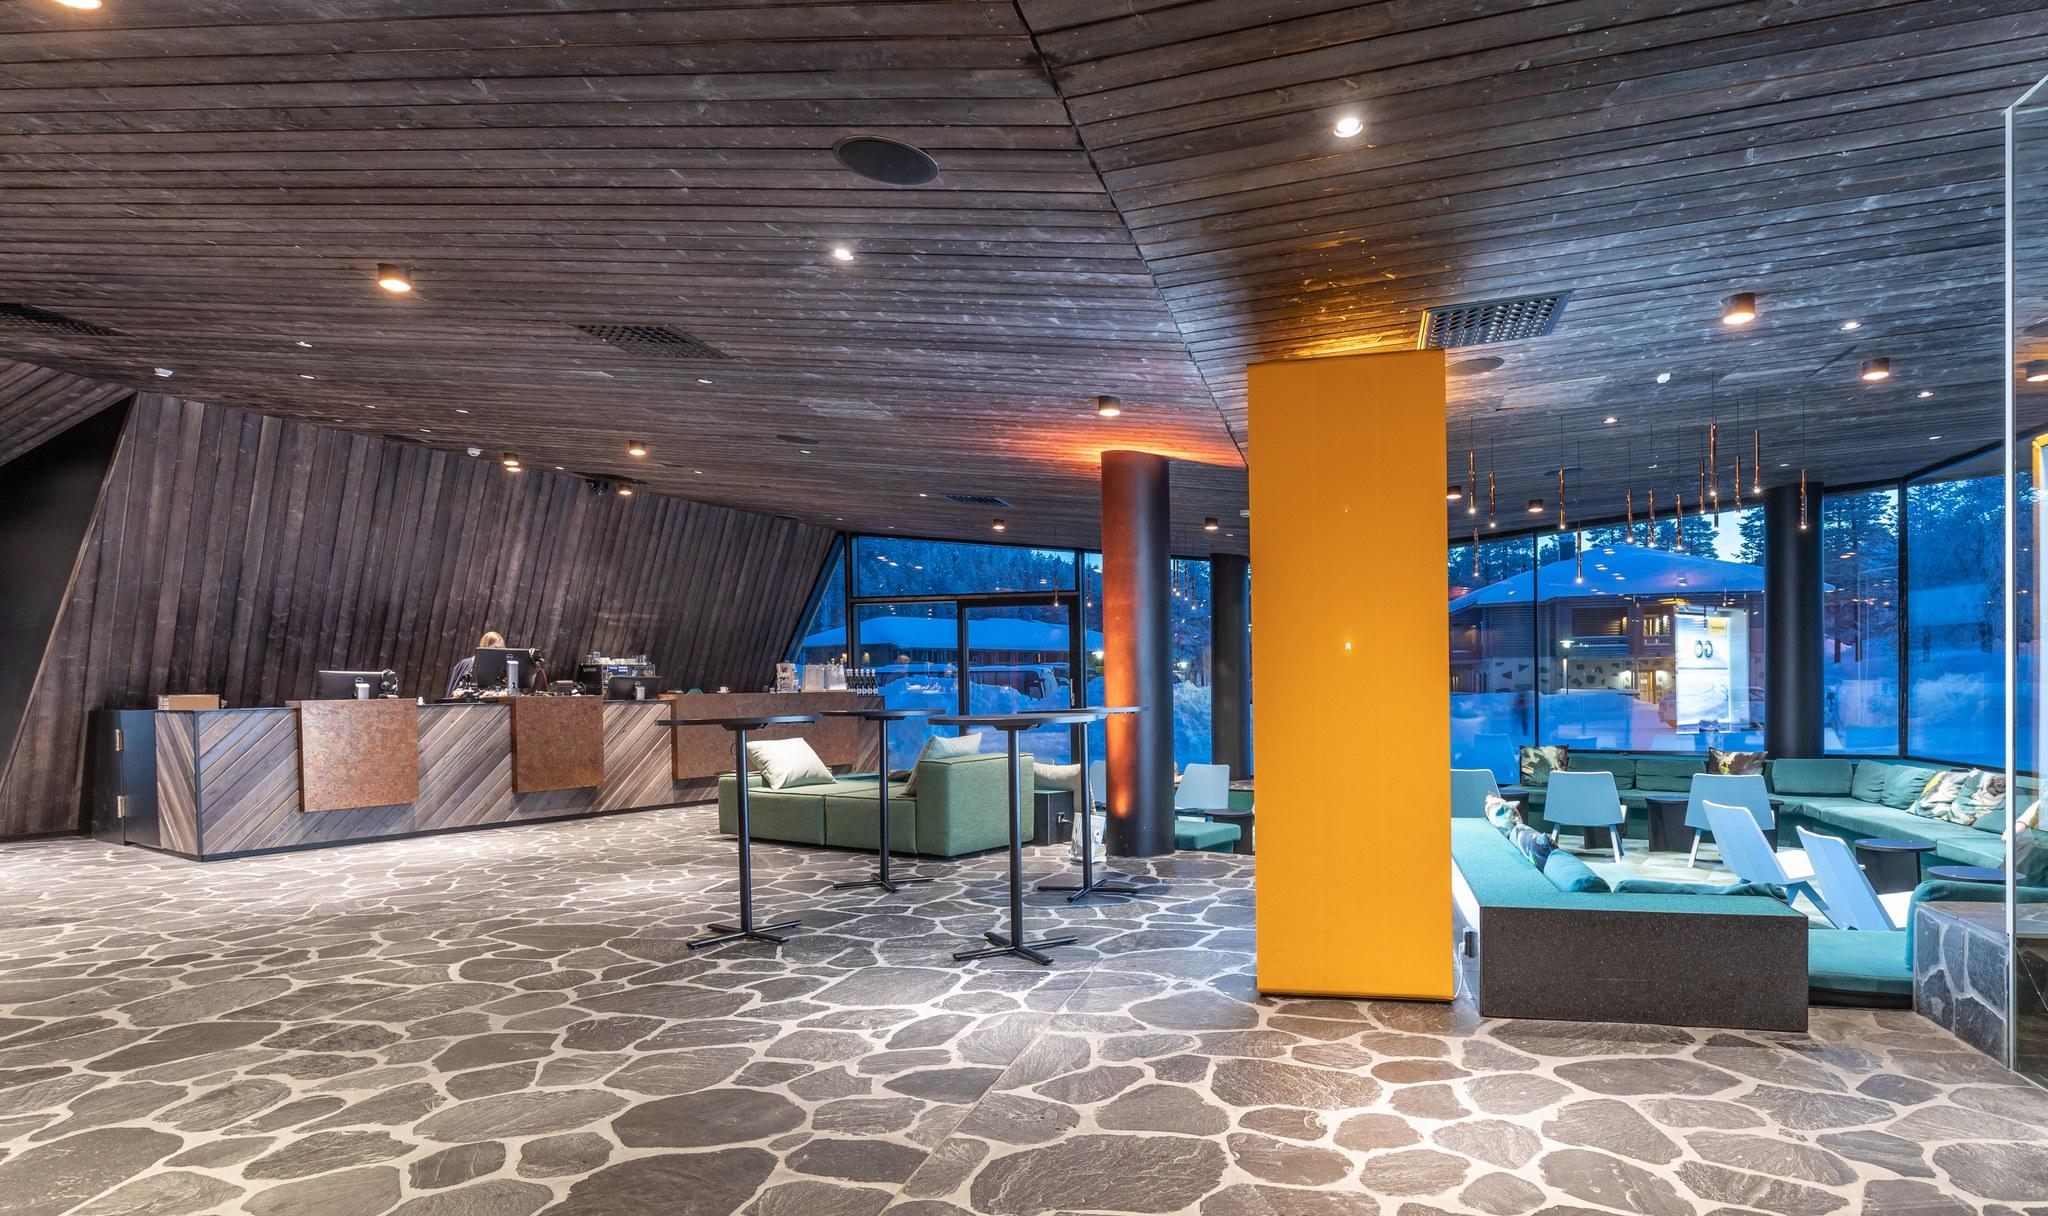 Design Hotel Levi 1 - Arno De La Chapelle